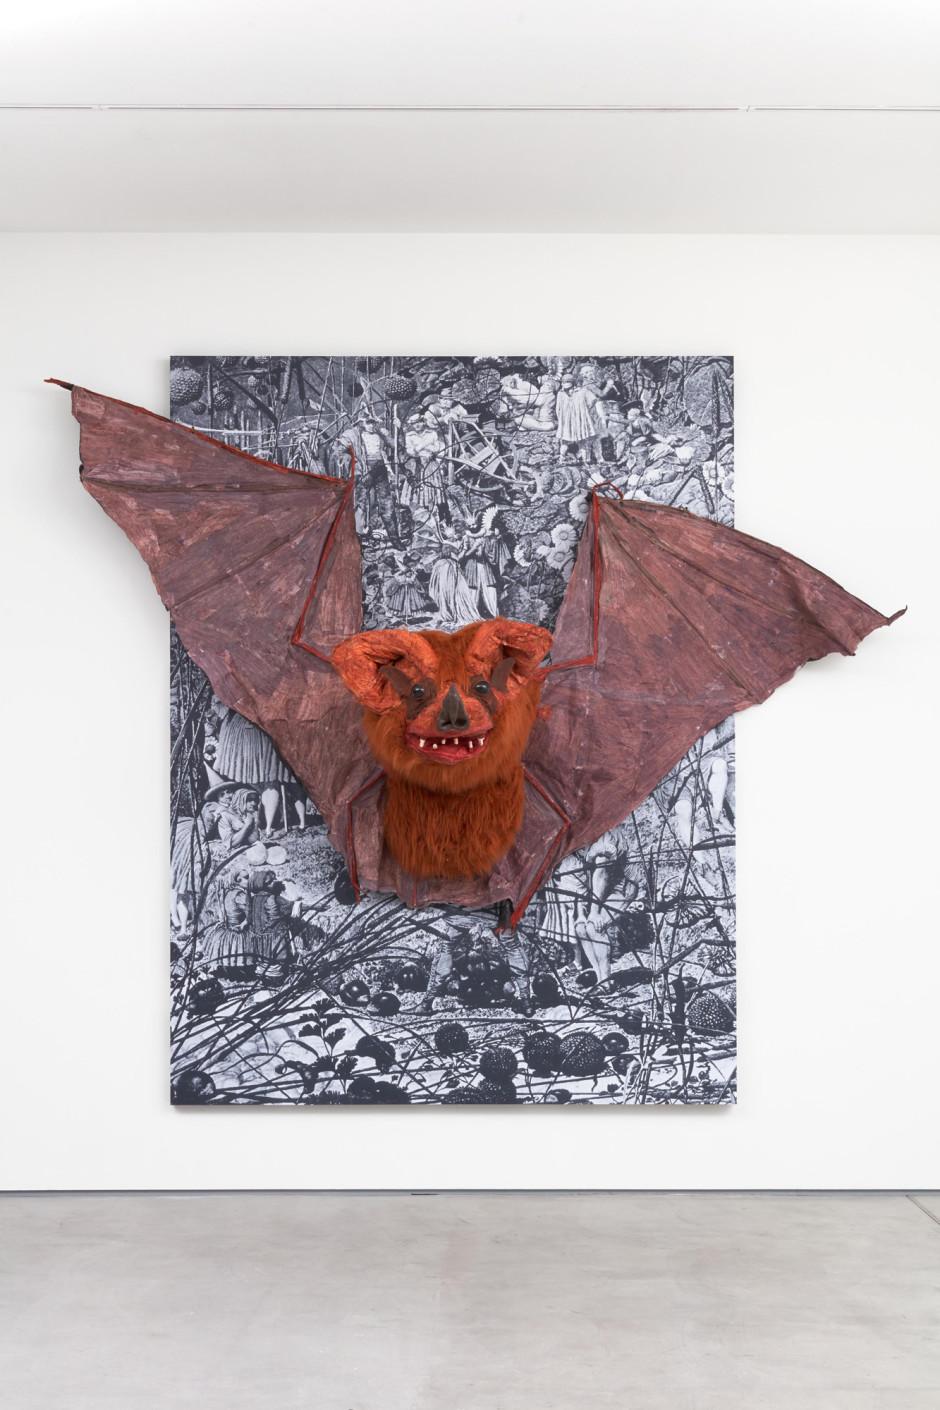 Bat, 2018  photocopies, wood, latex, fabric, paint  280 x 319 x 106 cm  110 ¼ x 125 ⅝ x 41 ¾ in.